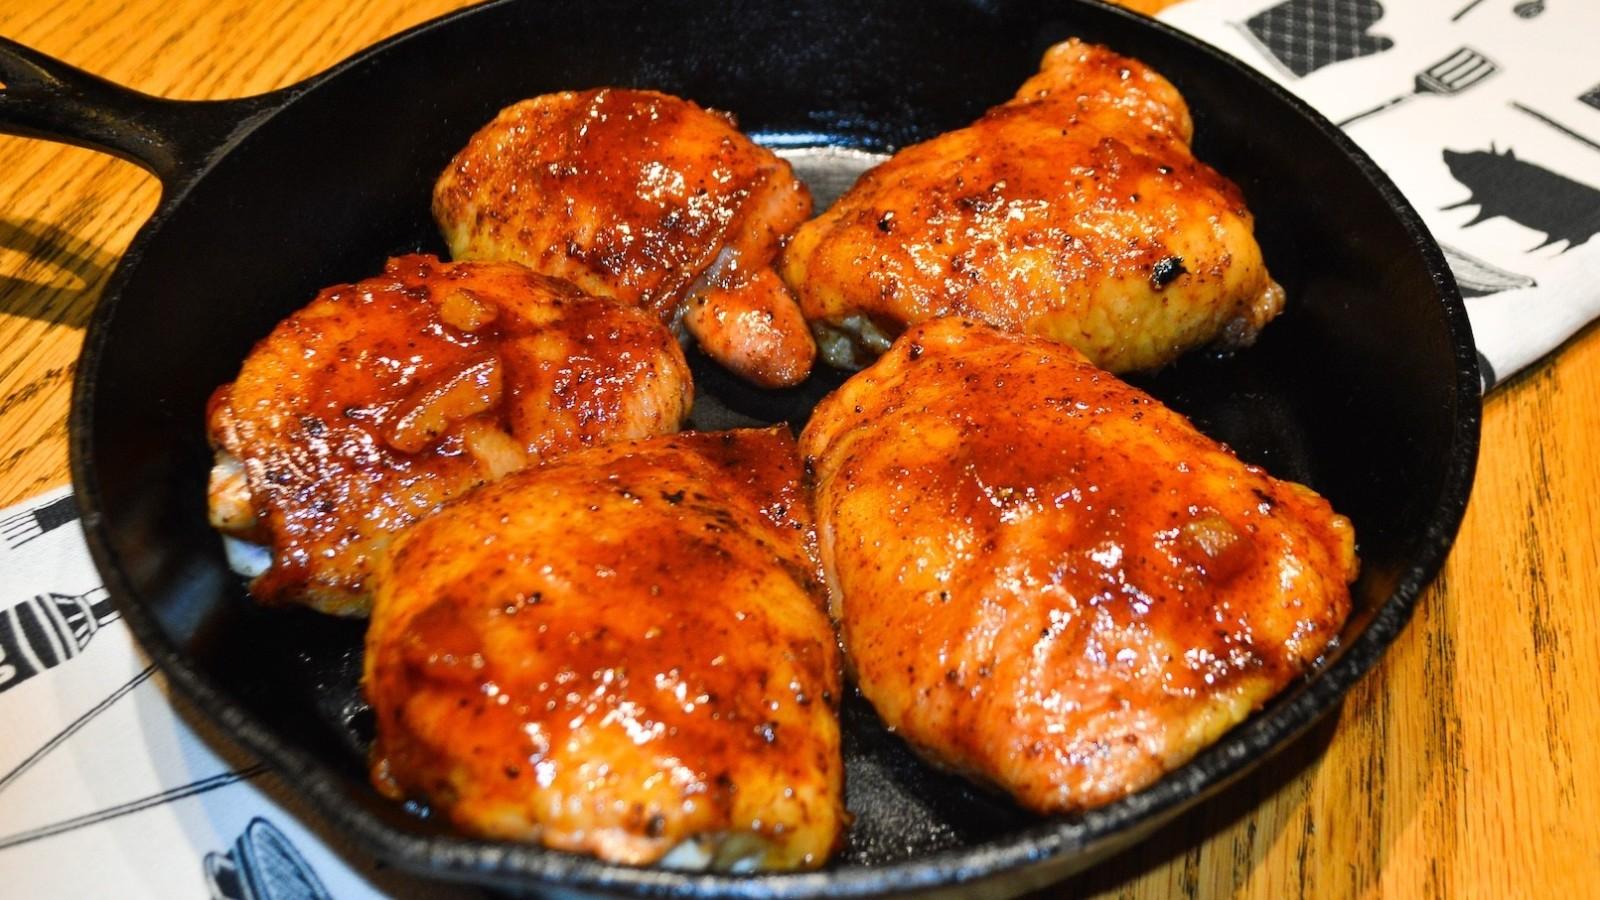 Image of Chipotle Orange Glaze Smoked Chicken Thighs